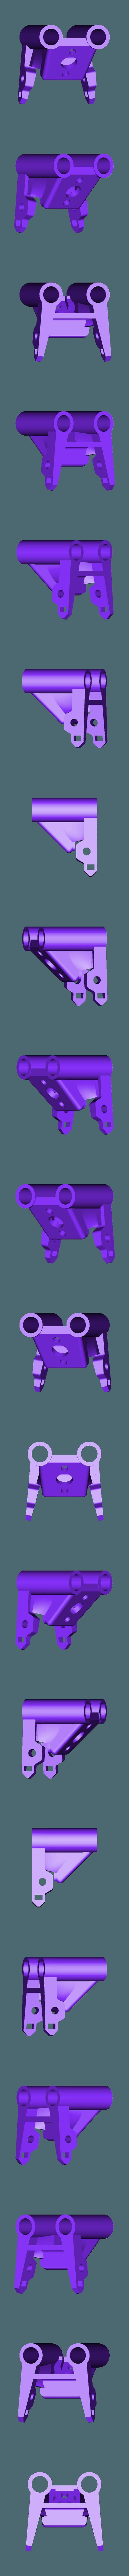 Mark4_45_Pig_Tail_crossf5.stl Download free STL file MARK 4 GEPRC SOFT MOUNT 45° PIGTAIL + CROSSFIRE • 3D printable model, Rhizamax